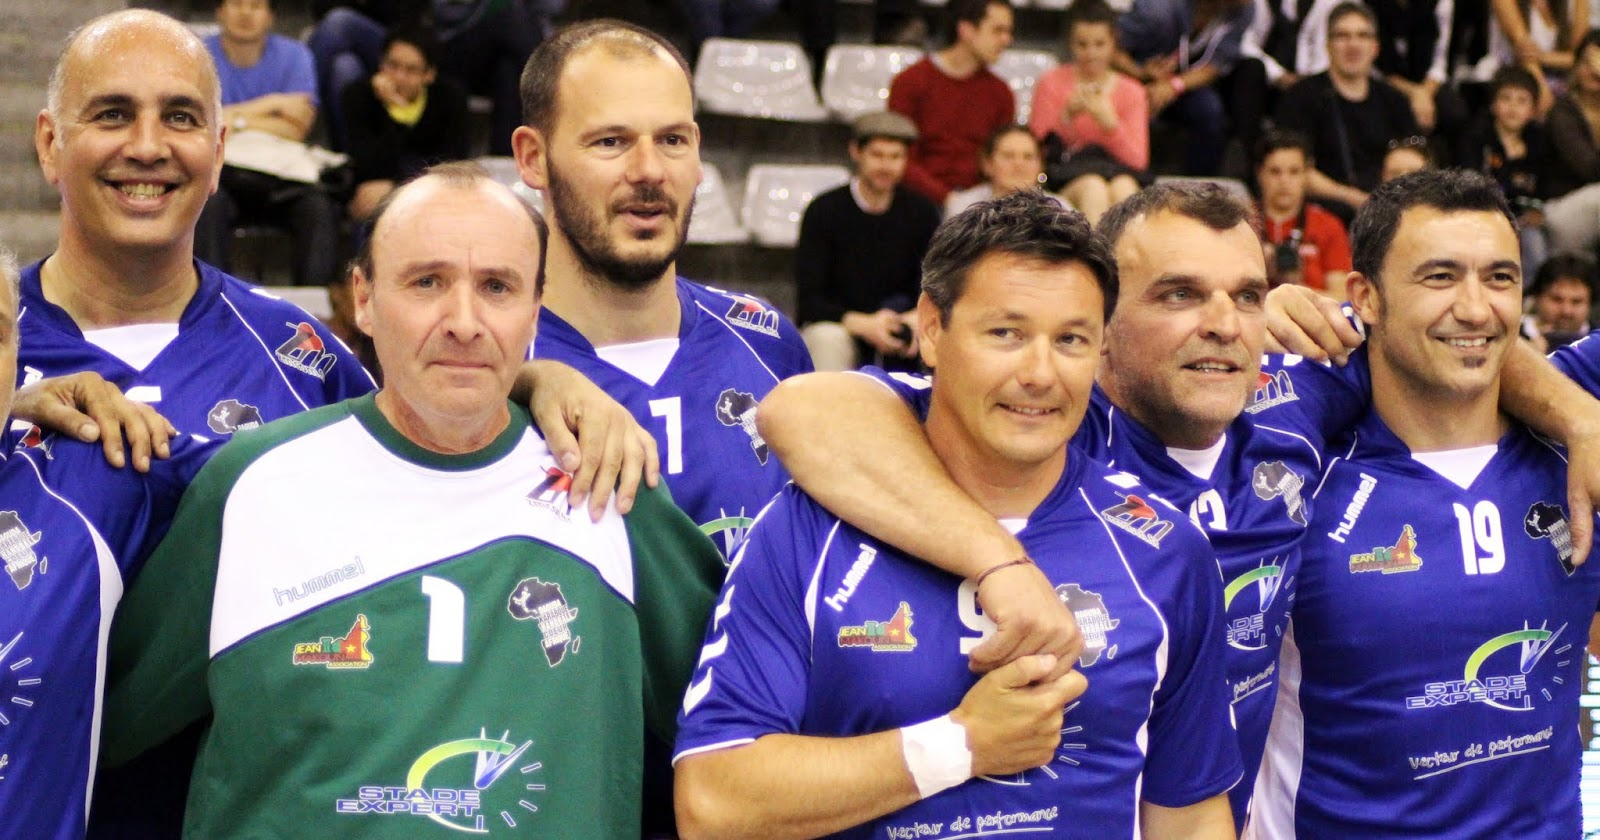 des barjots aux experts 20 ans de handball franais